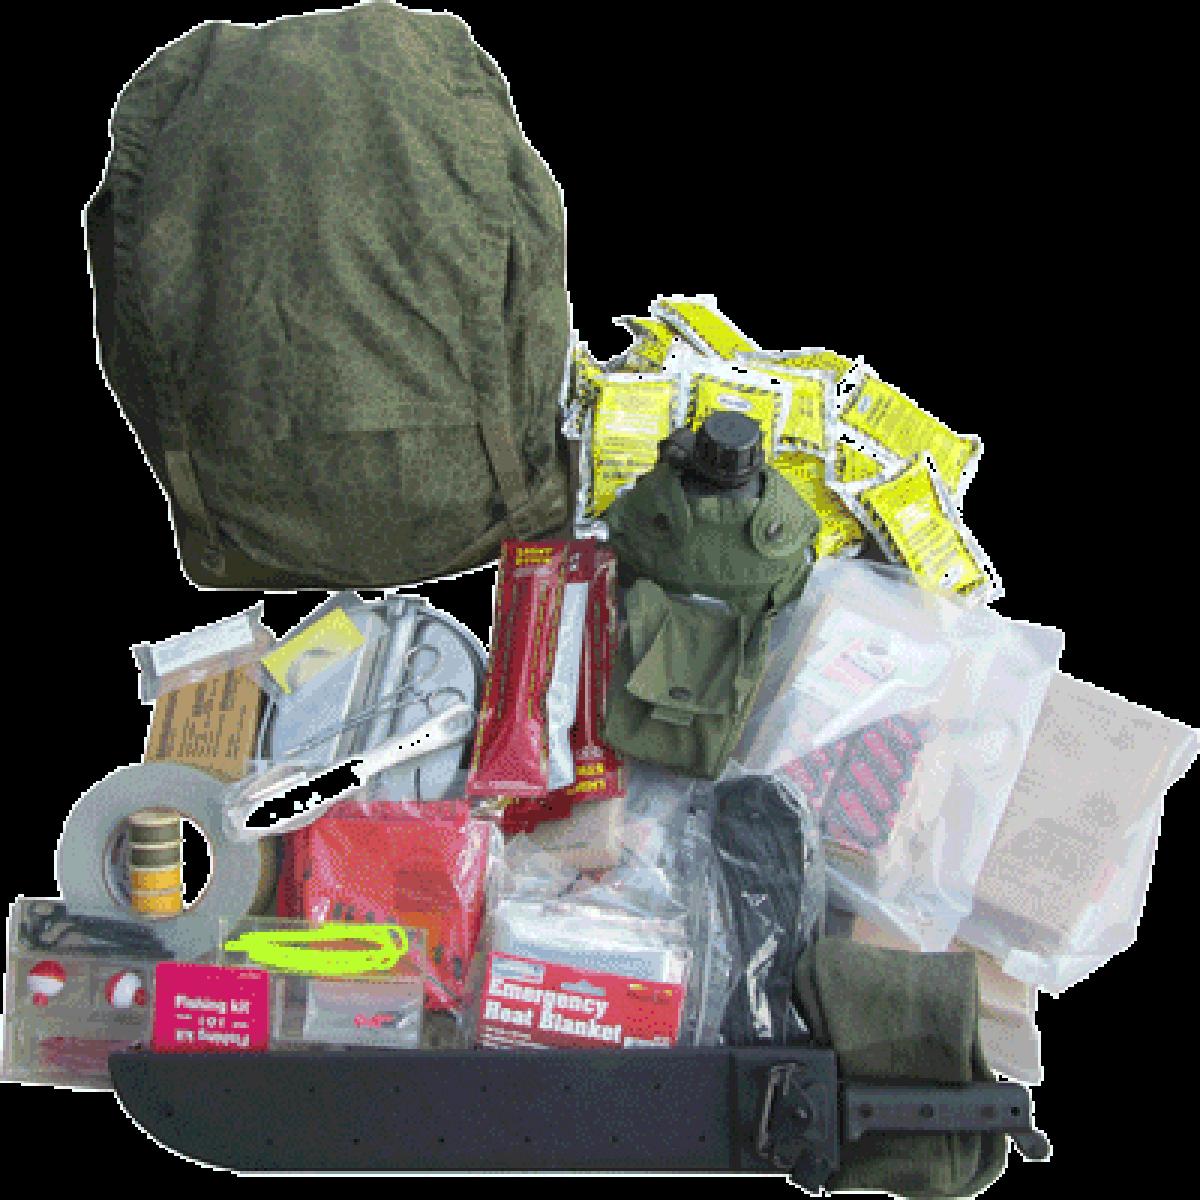 Military Surplus Survival Kit/Bug Out Bag